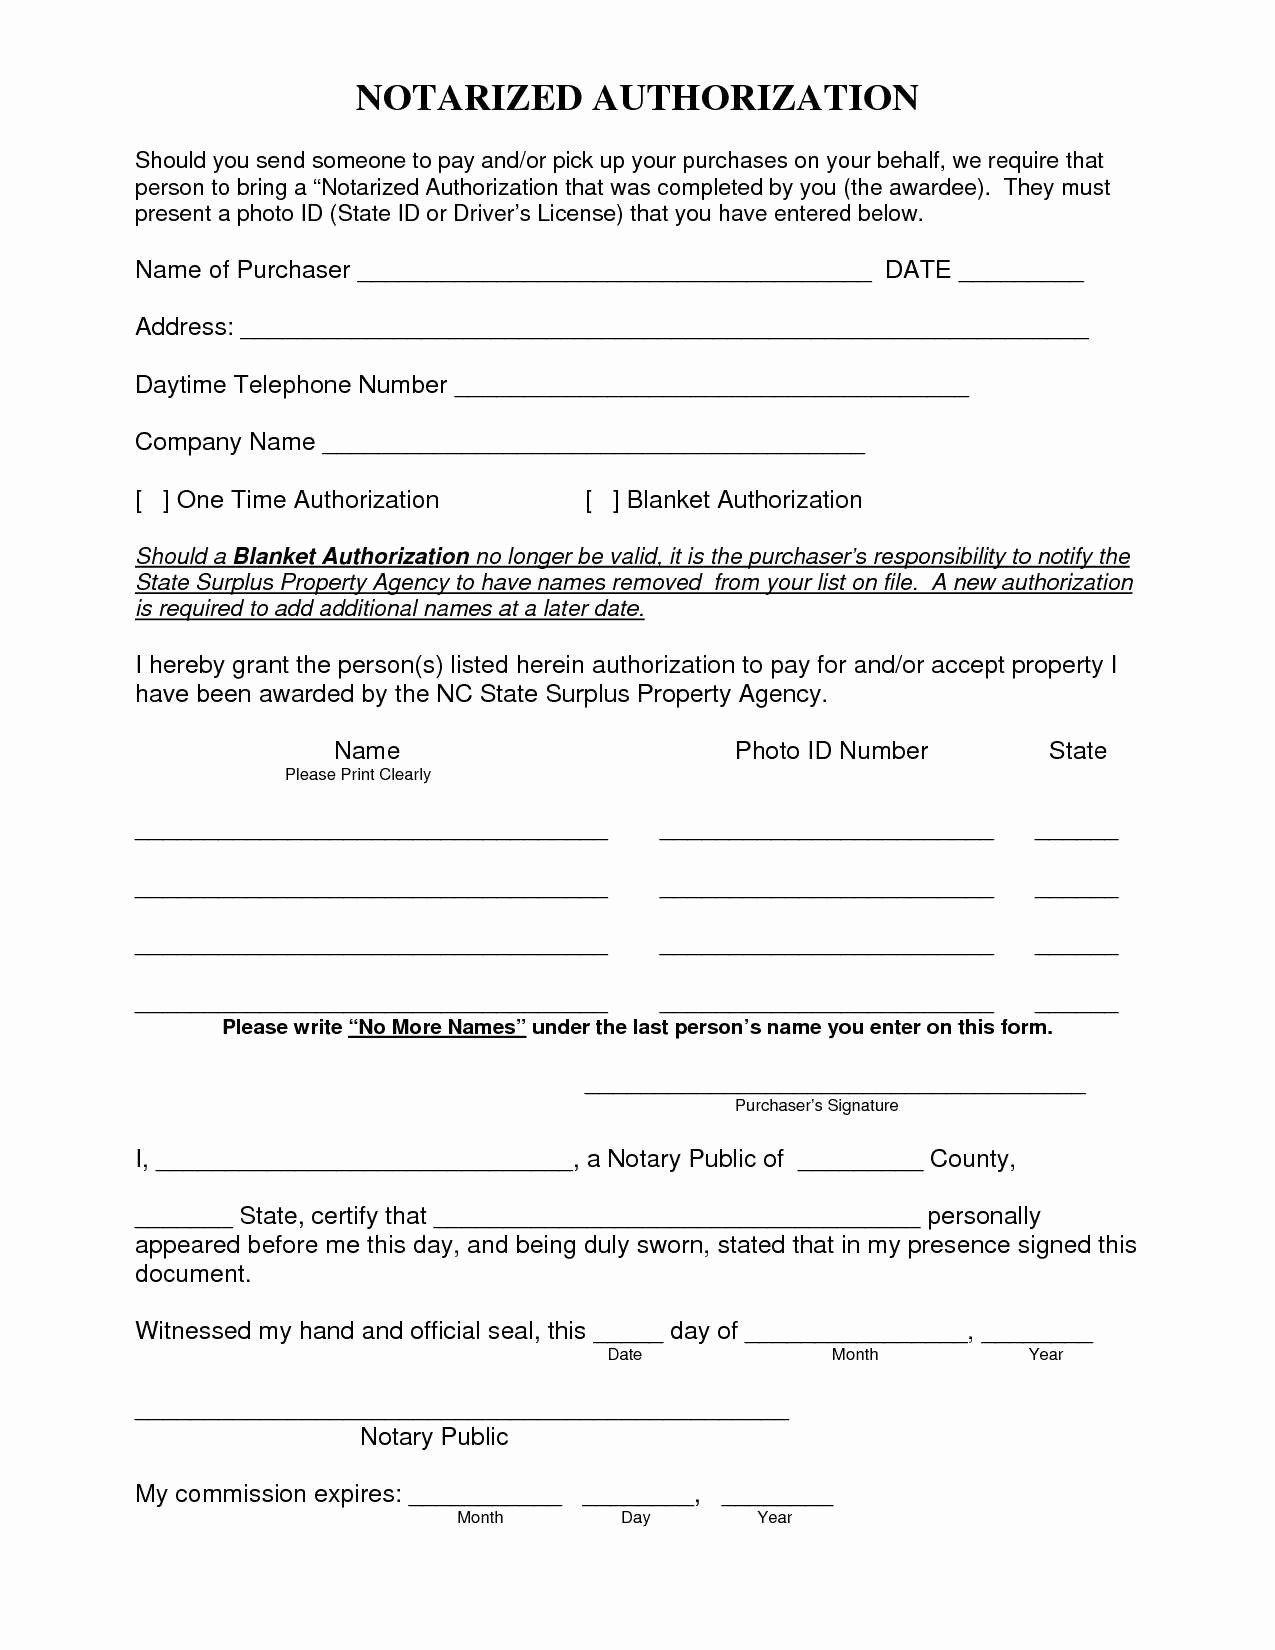 Notarized Custody Agreement Template Lovely Notarized Custody Agreement Template Special 11 Best Child Custody Agreement Joint Custody Child Custody